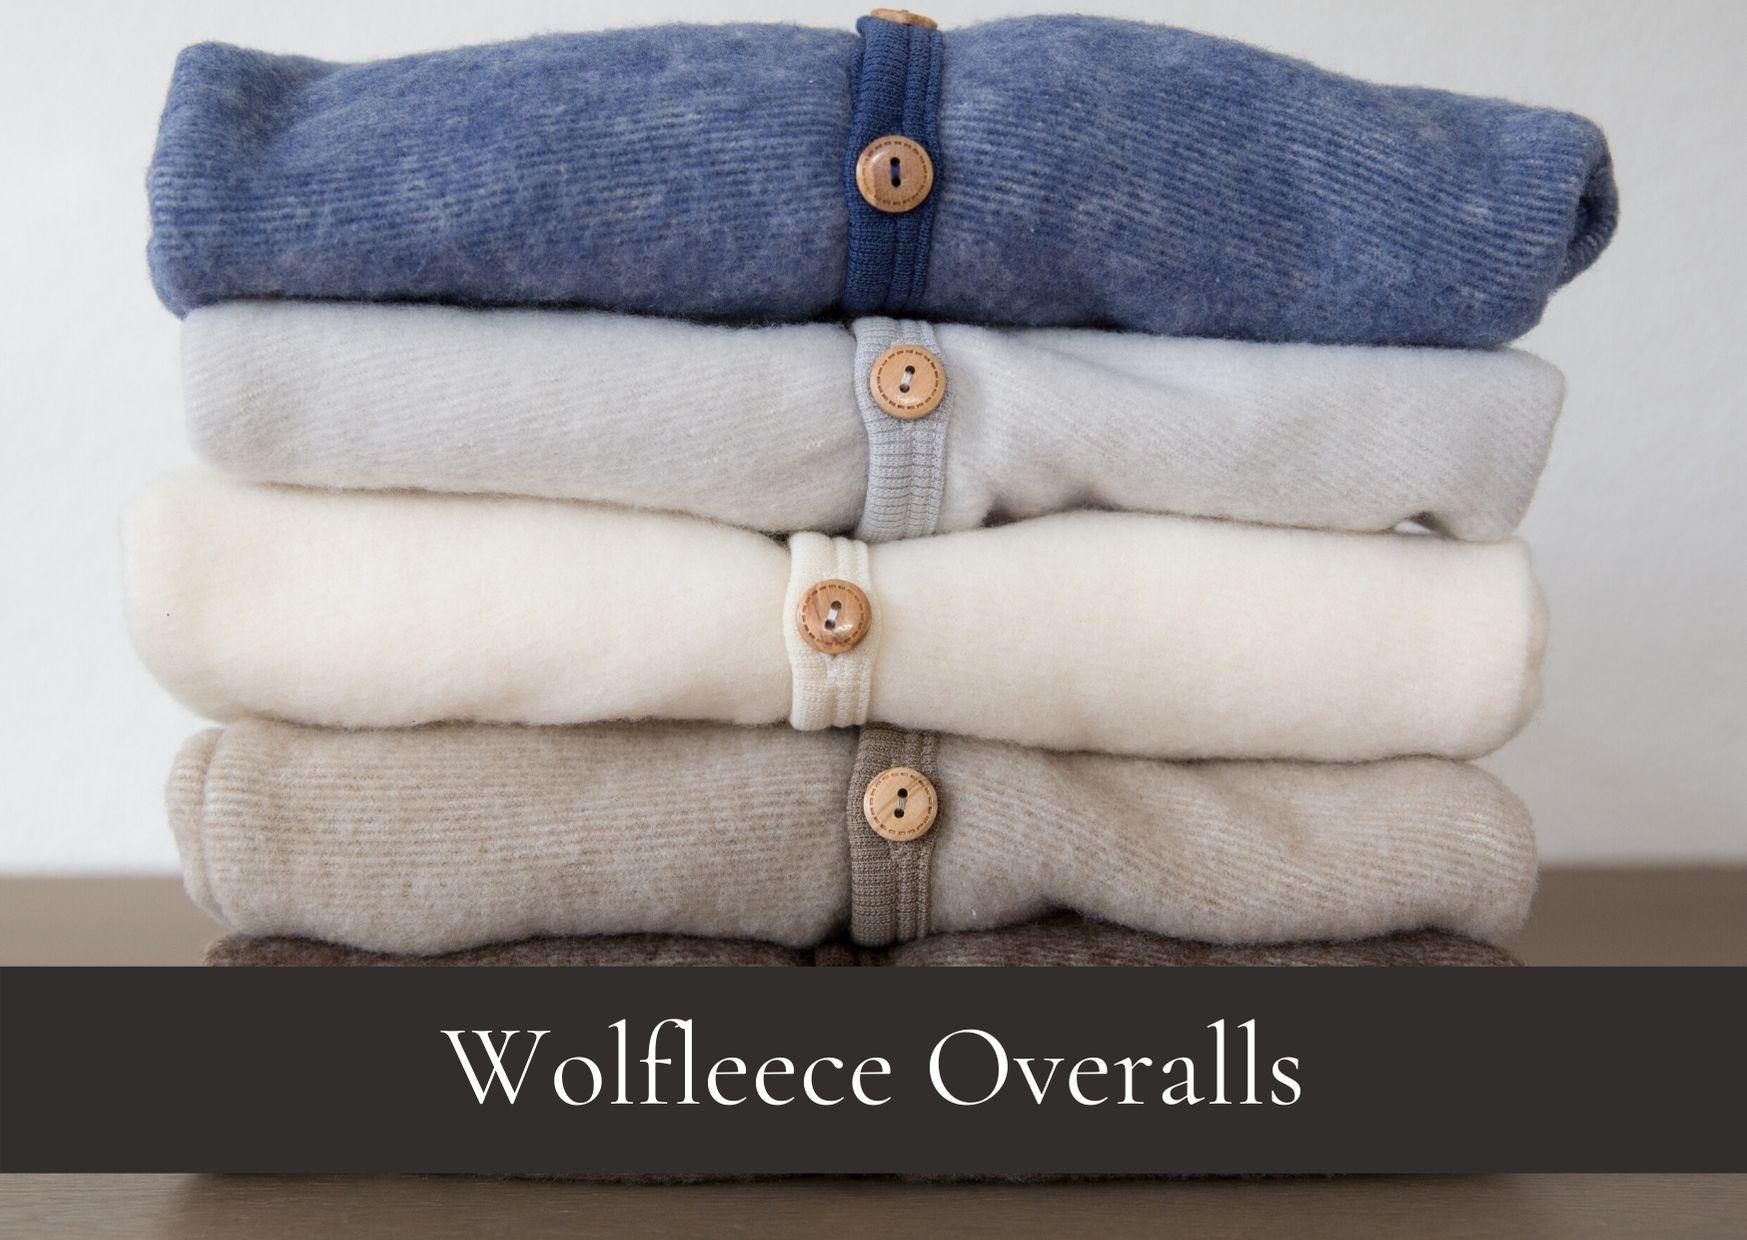 wol-fleece-overalls